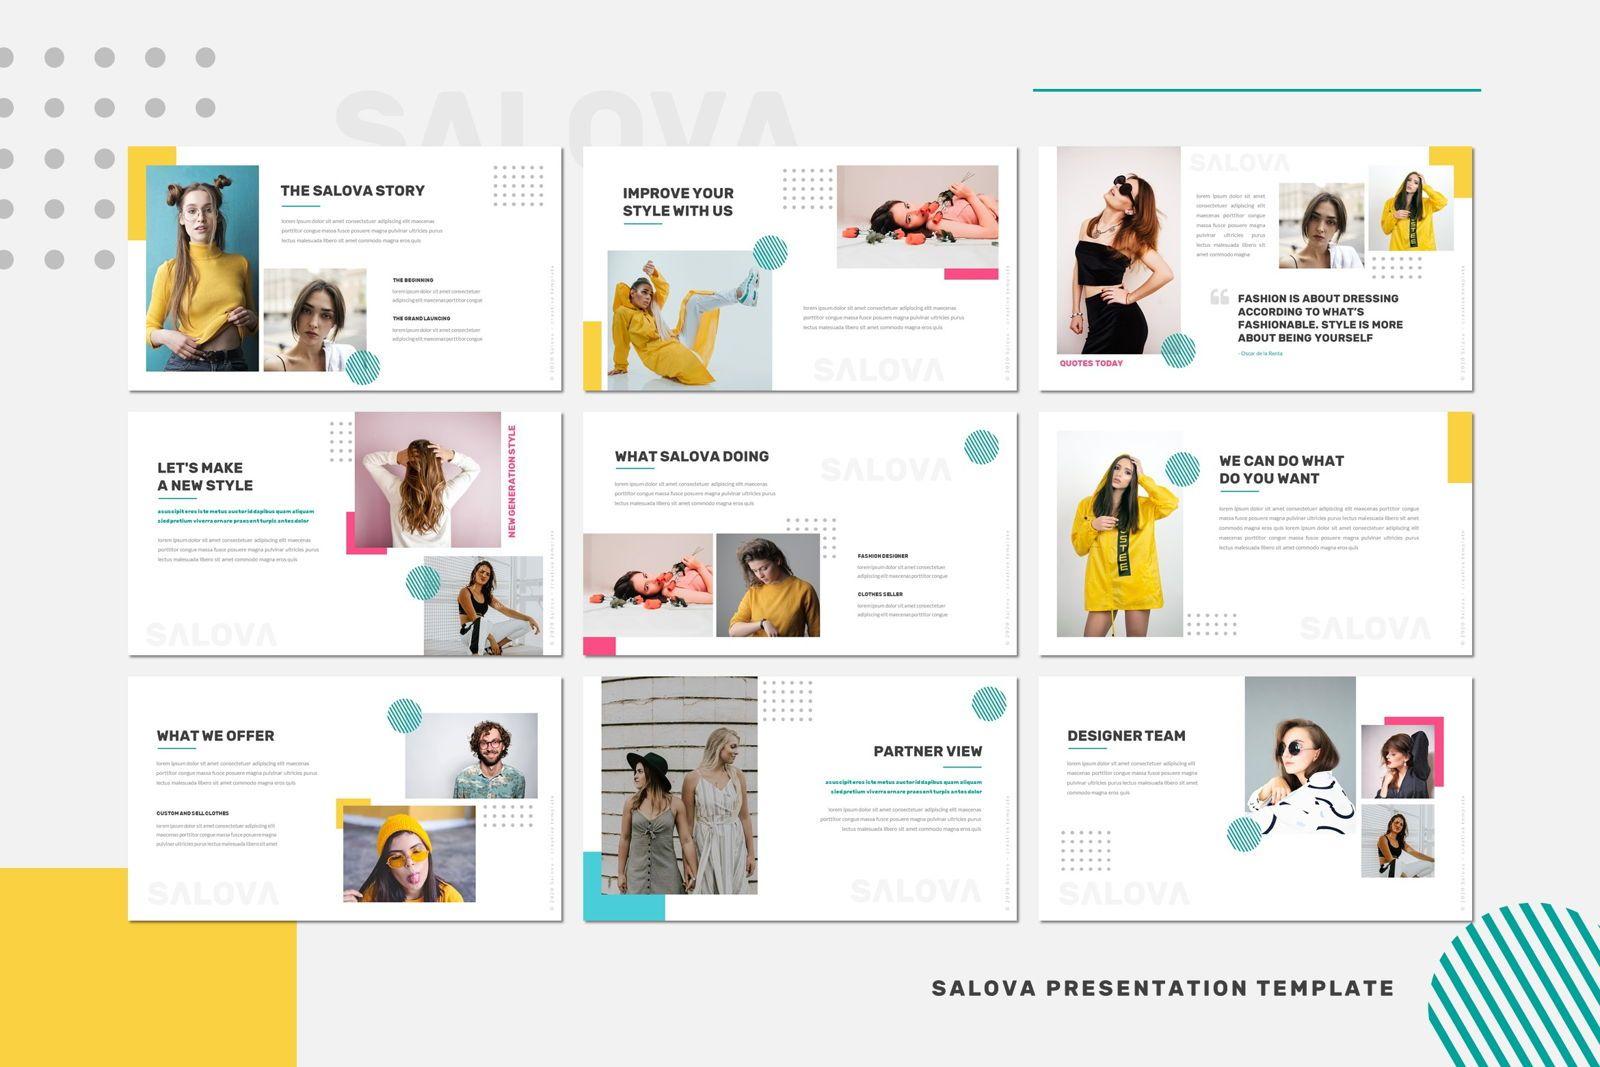 Salova - Google Slides Template, Slide 3, 07981, Presentation Templates — PoweredTemplate.com